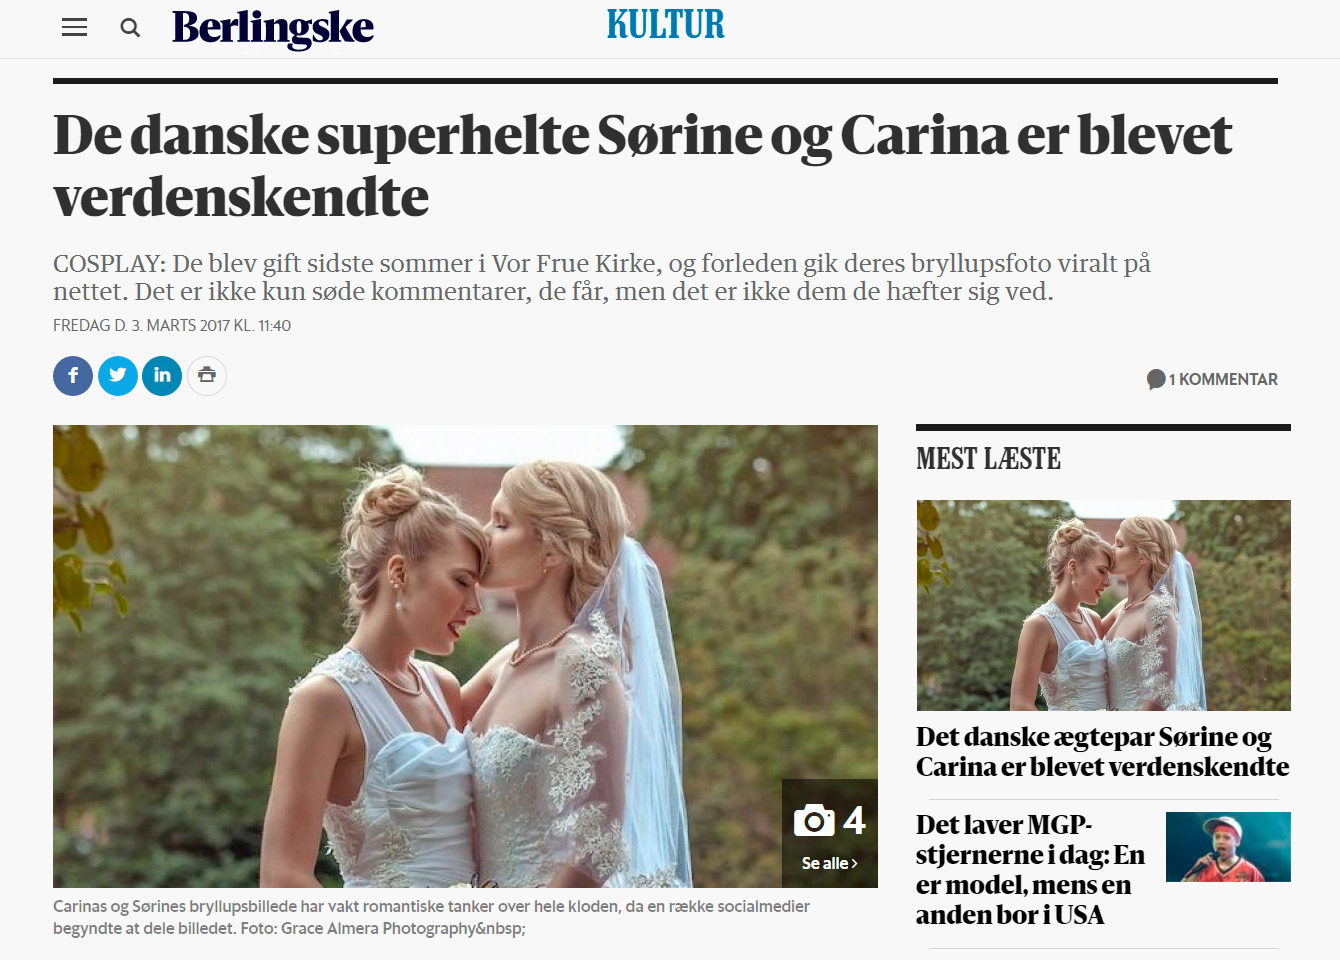 berlingske-lgbt-wedding-carina-surine-wedding-happily-ever-after-love-is-love.jpg